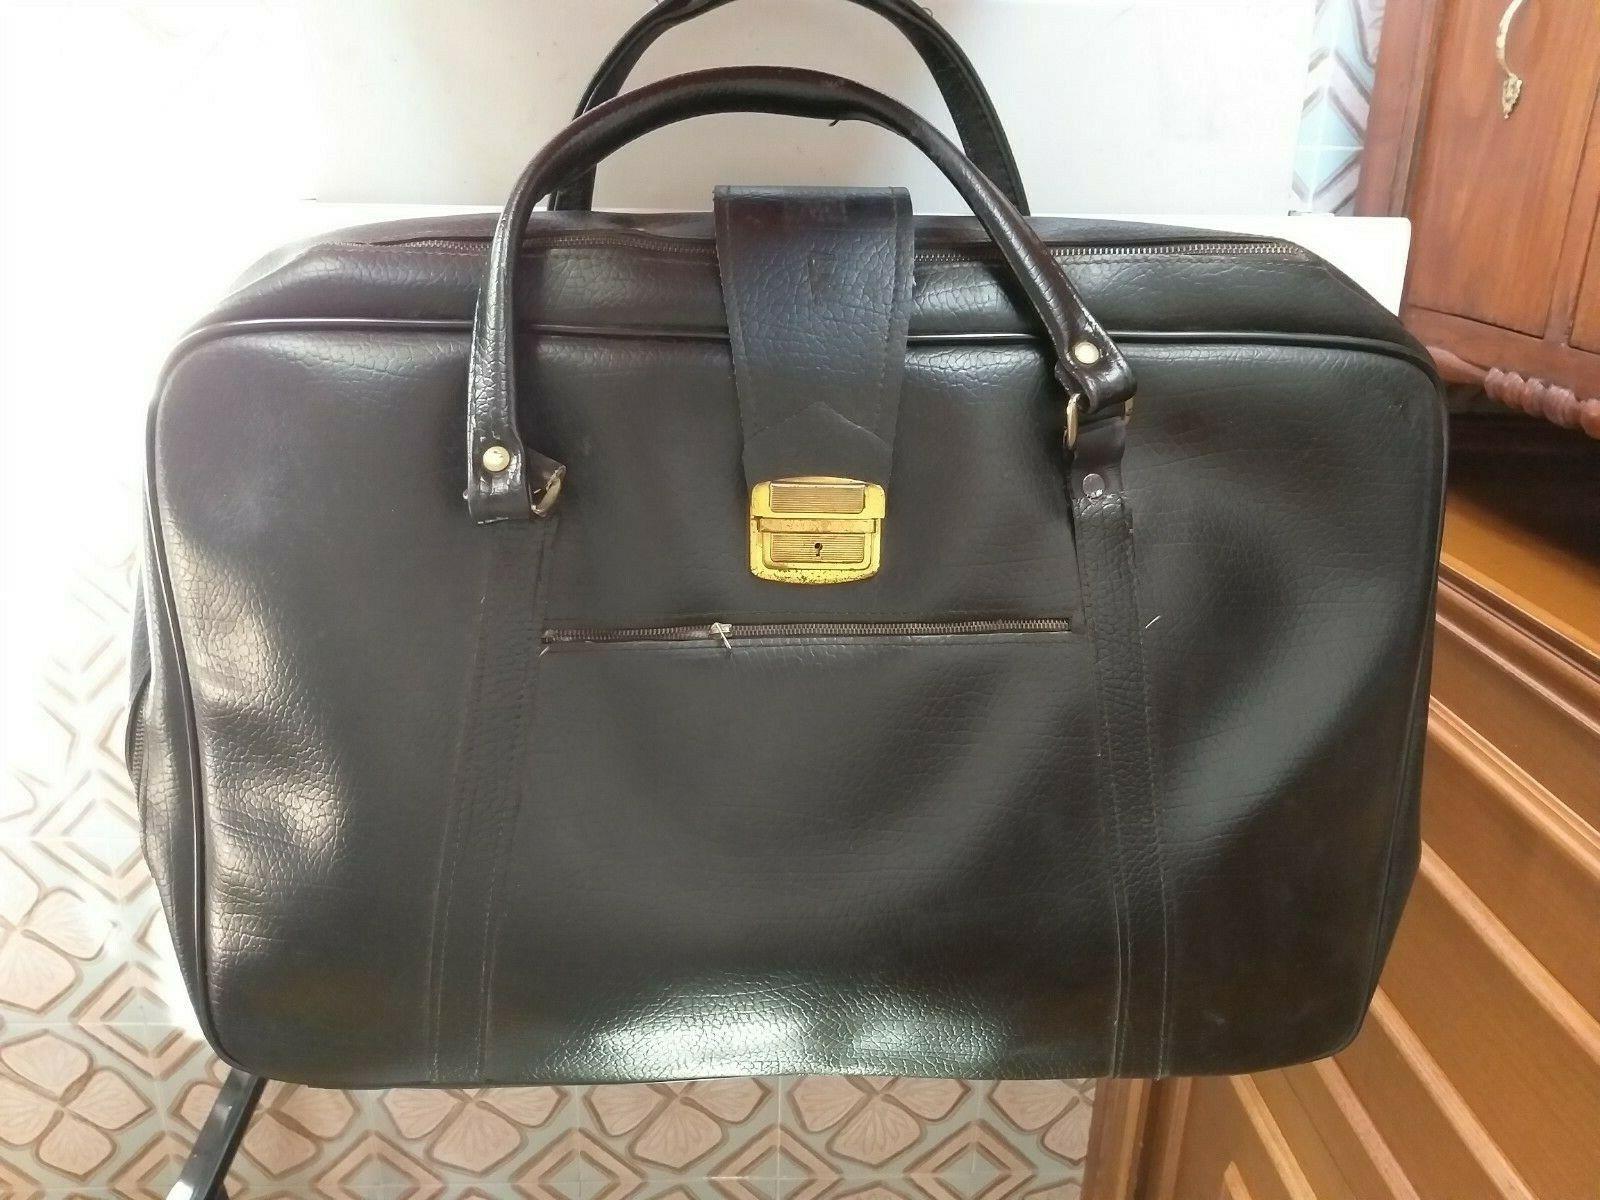 Valigia borsa in pelle nera Vintage